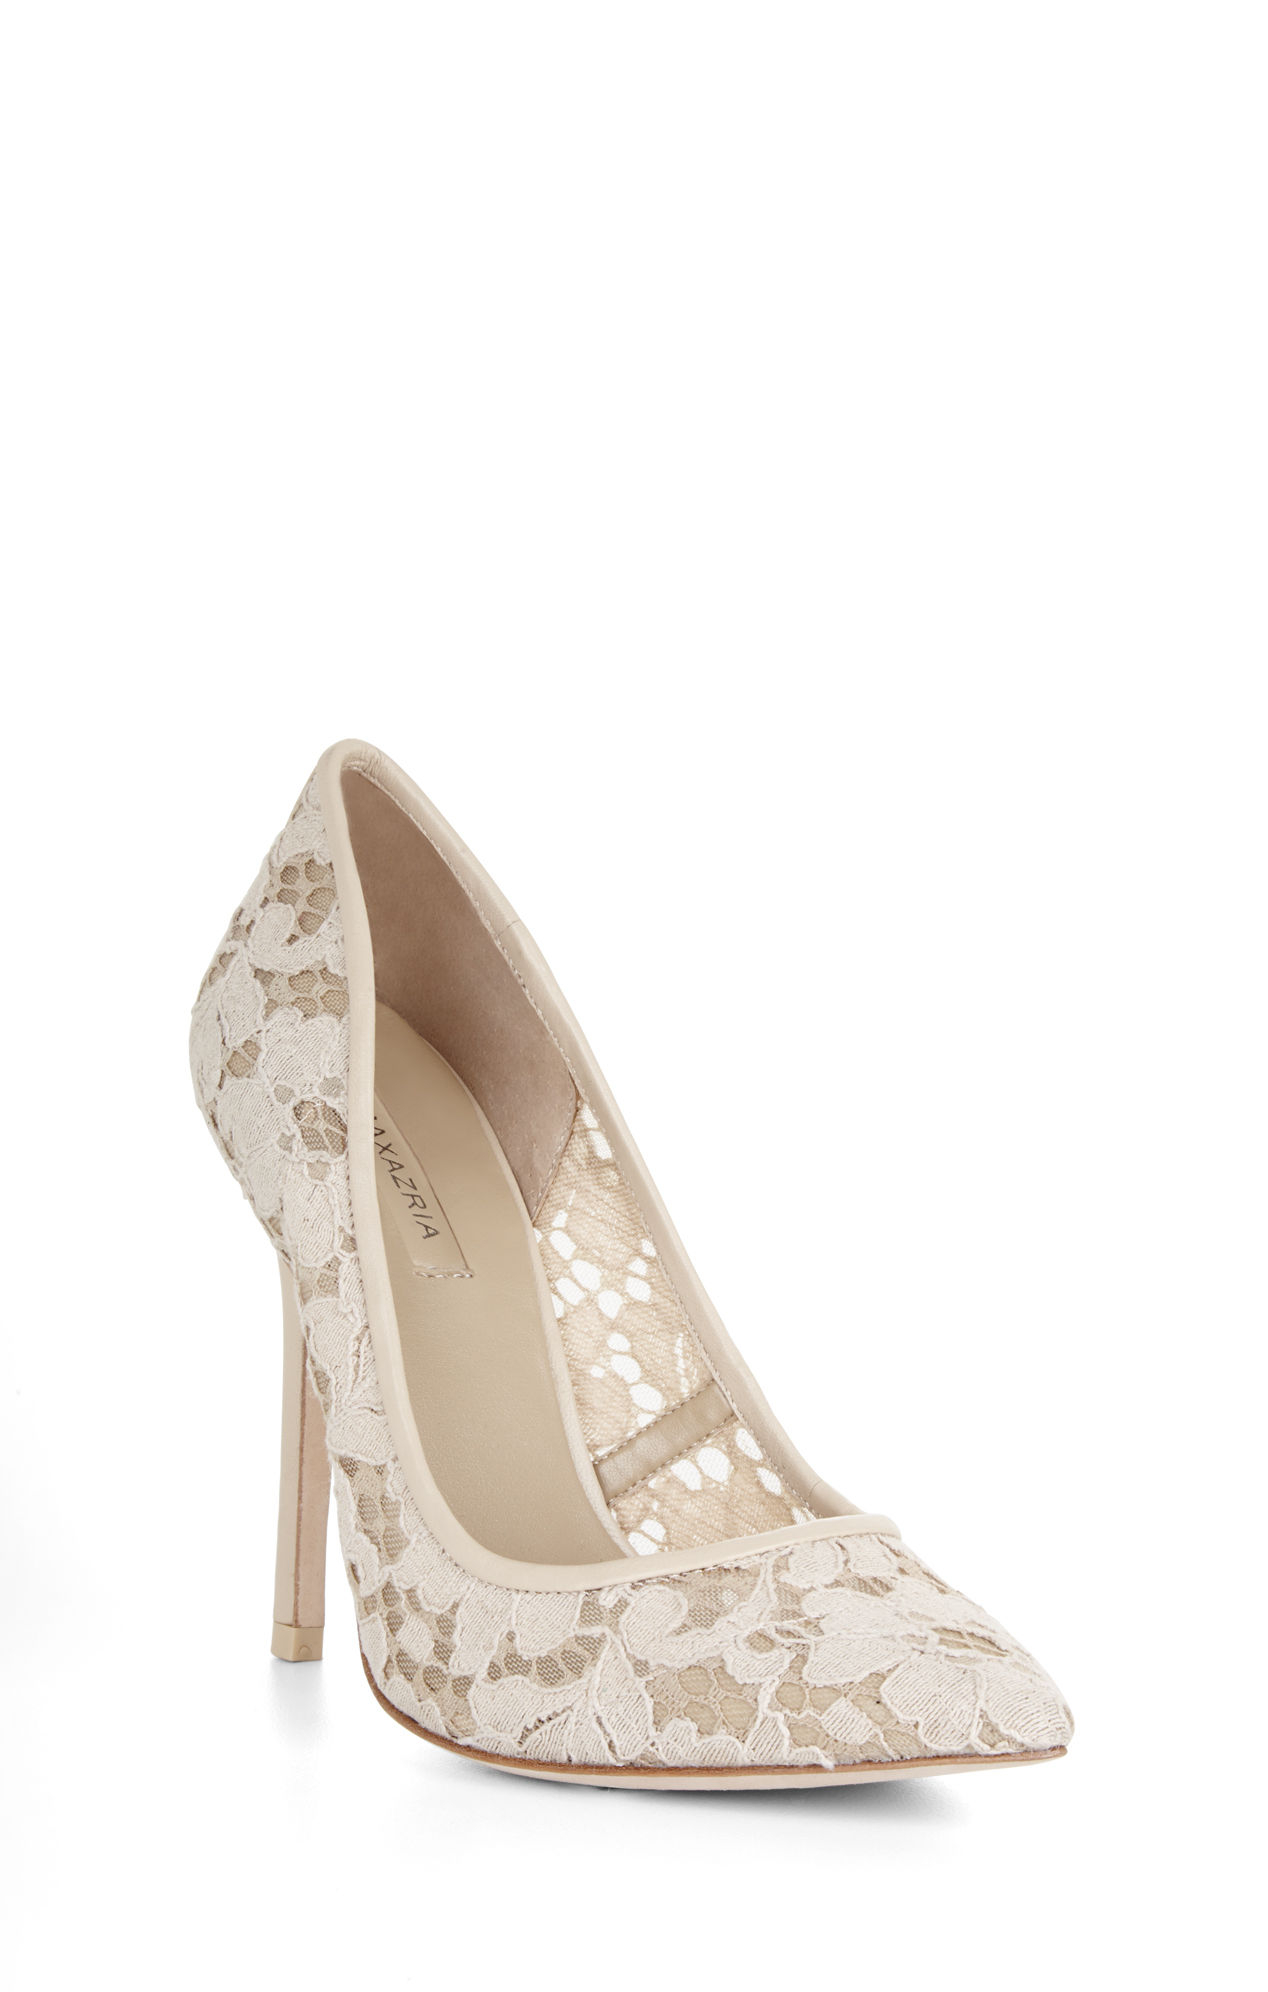 904a8b2568846f Lyst bcbgmaxazria opia high heel lace pointed toe pump in natural jpg  1268x1992 Bcbg natural heels